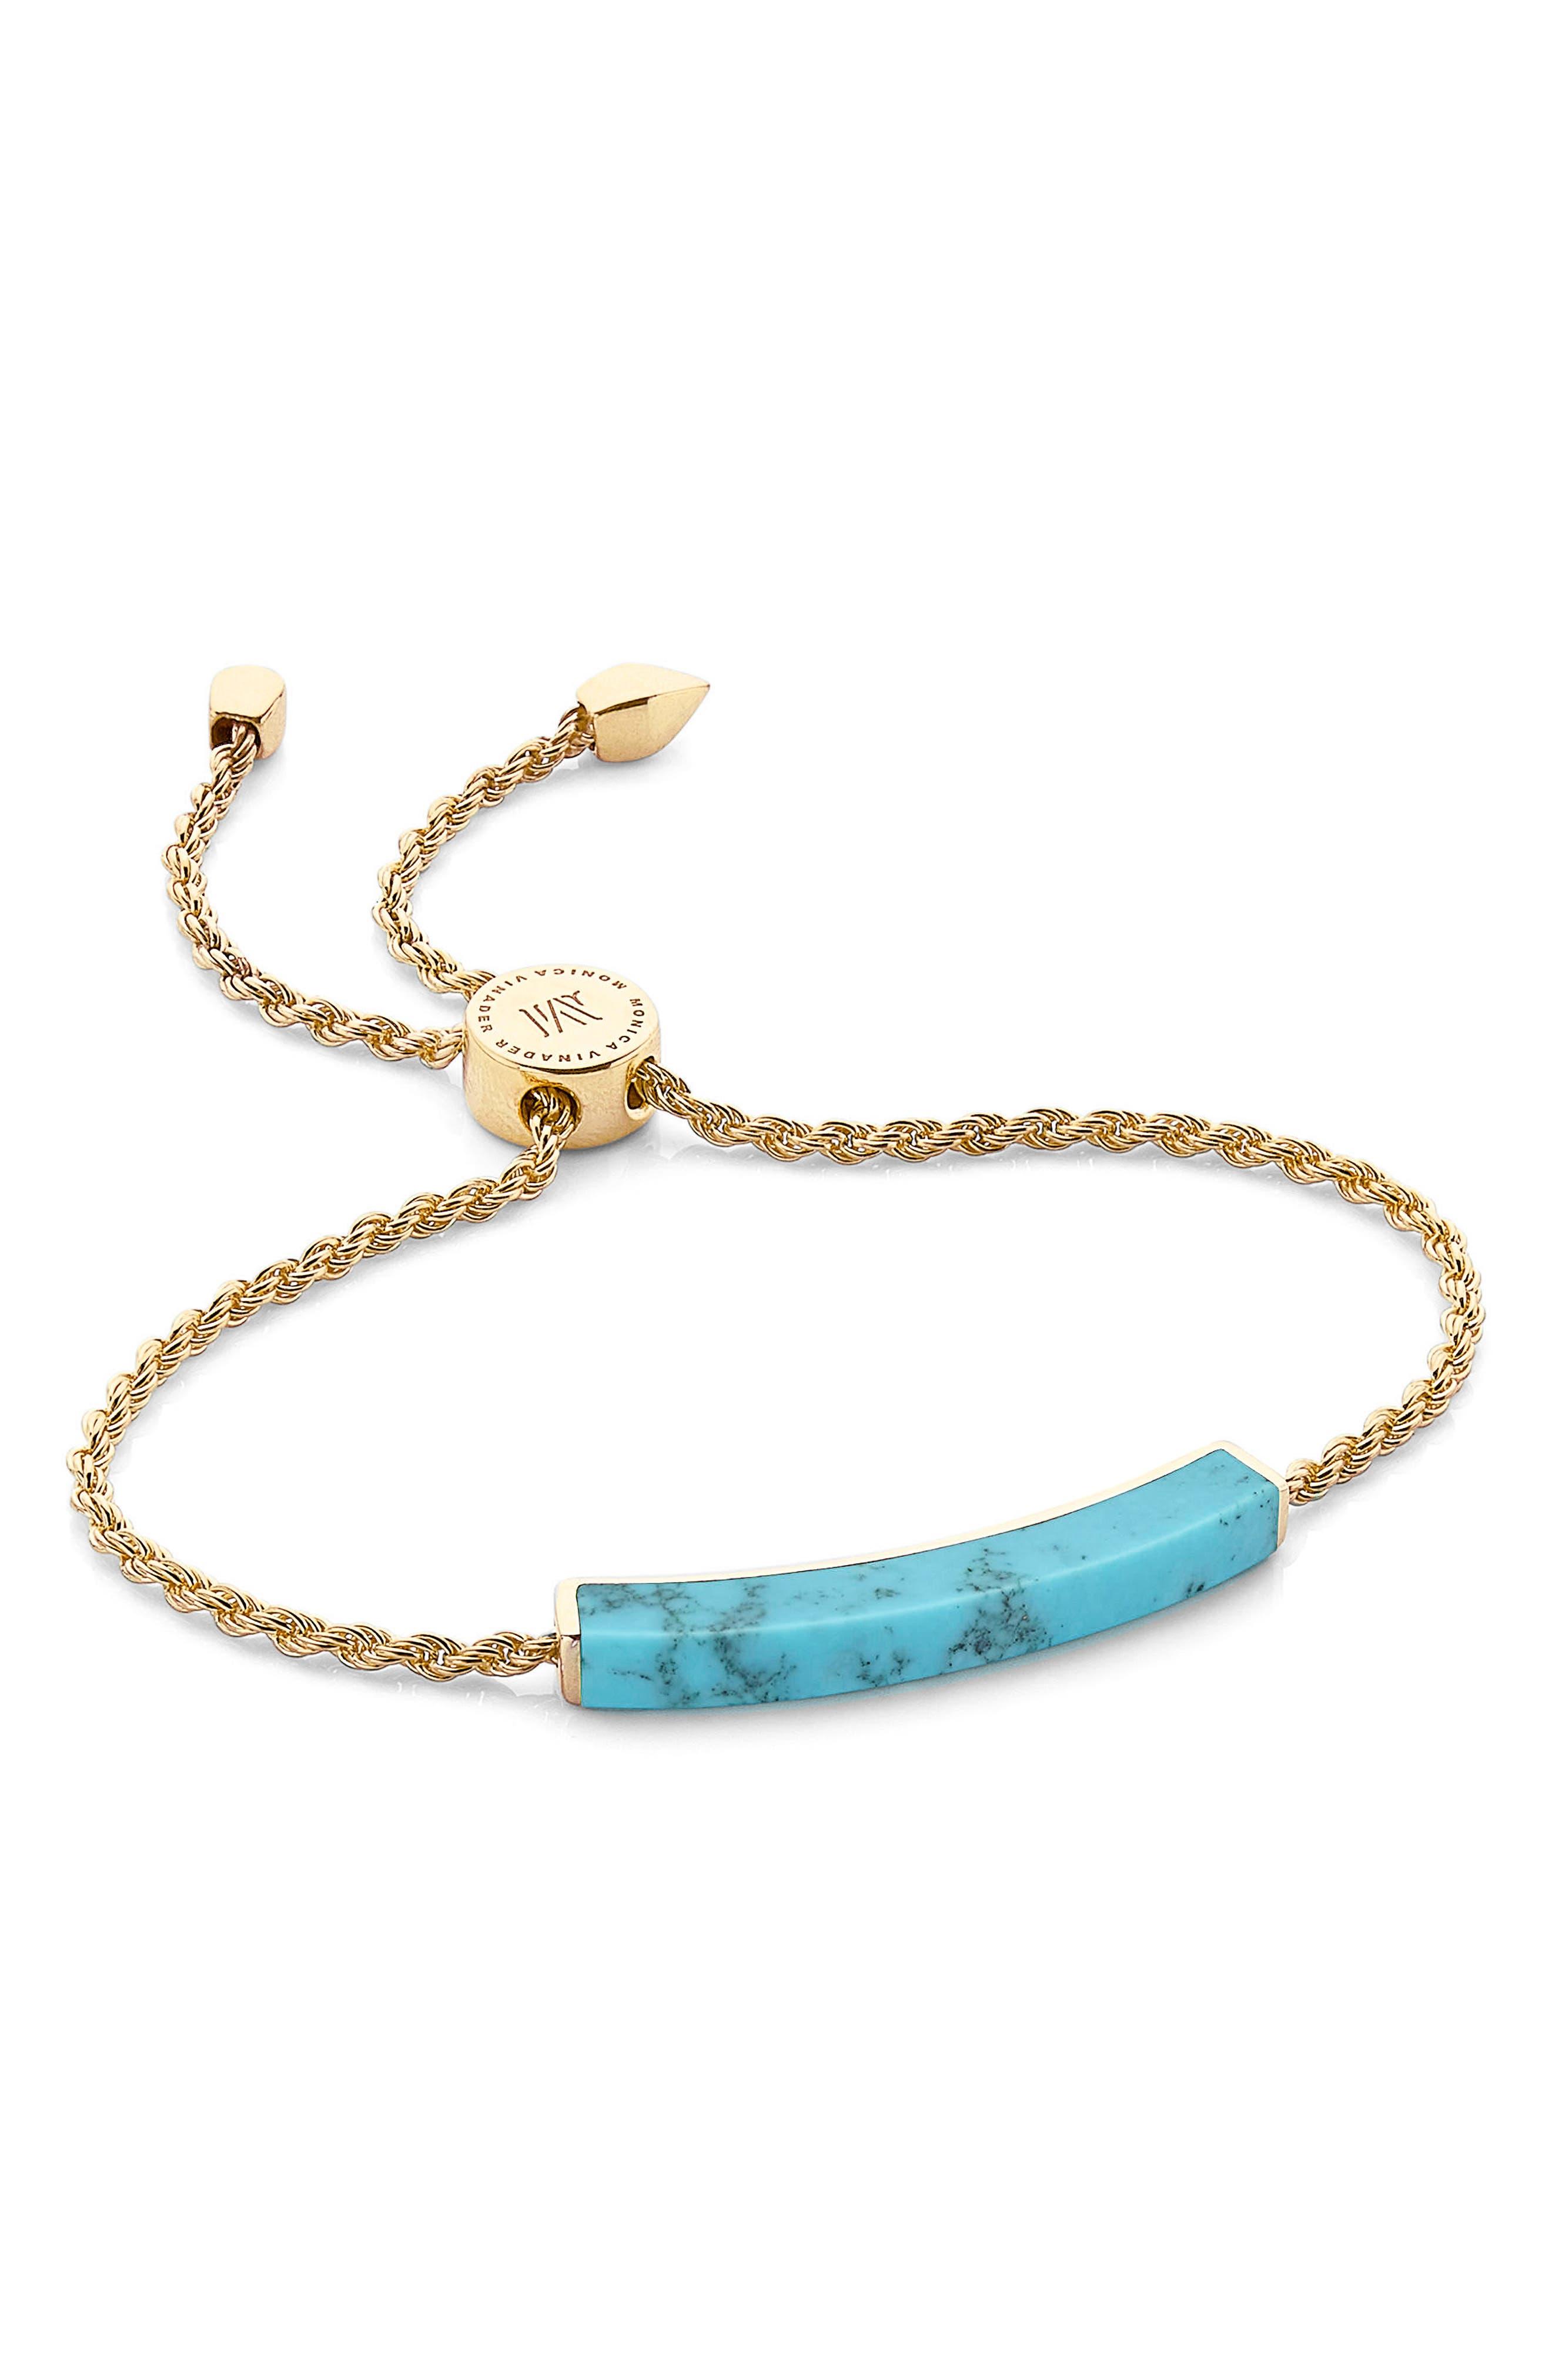 Linear Semiprecious Stone Friendship Bracelet,                             Main thumbnail 1, color,                             400